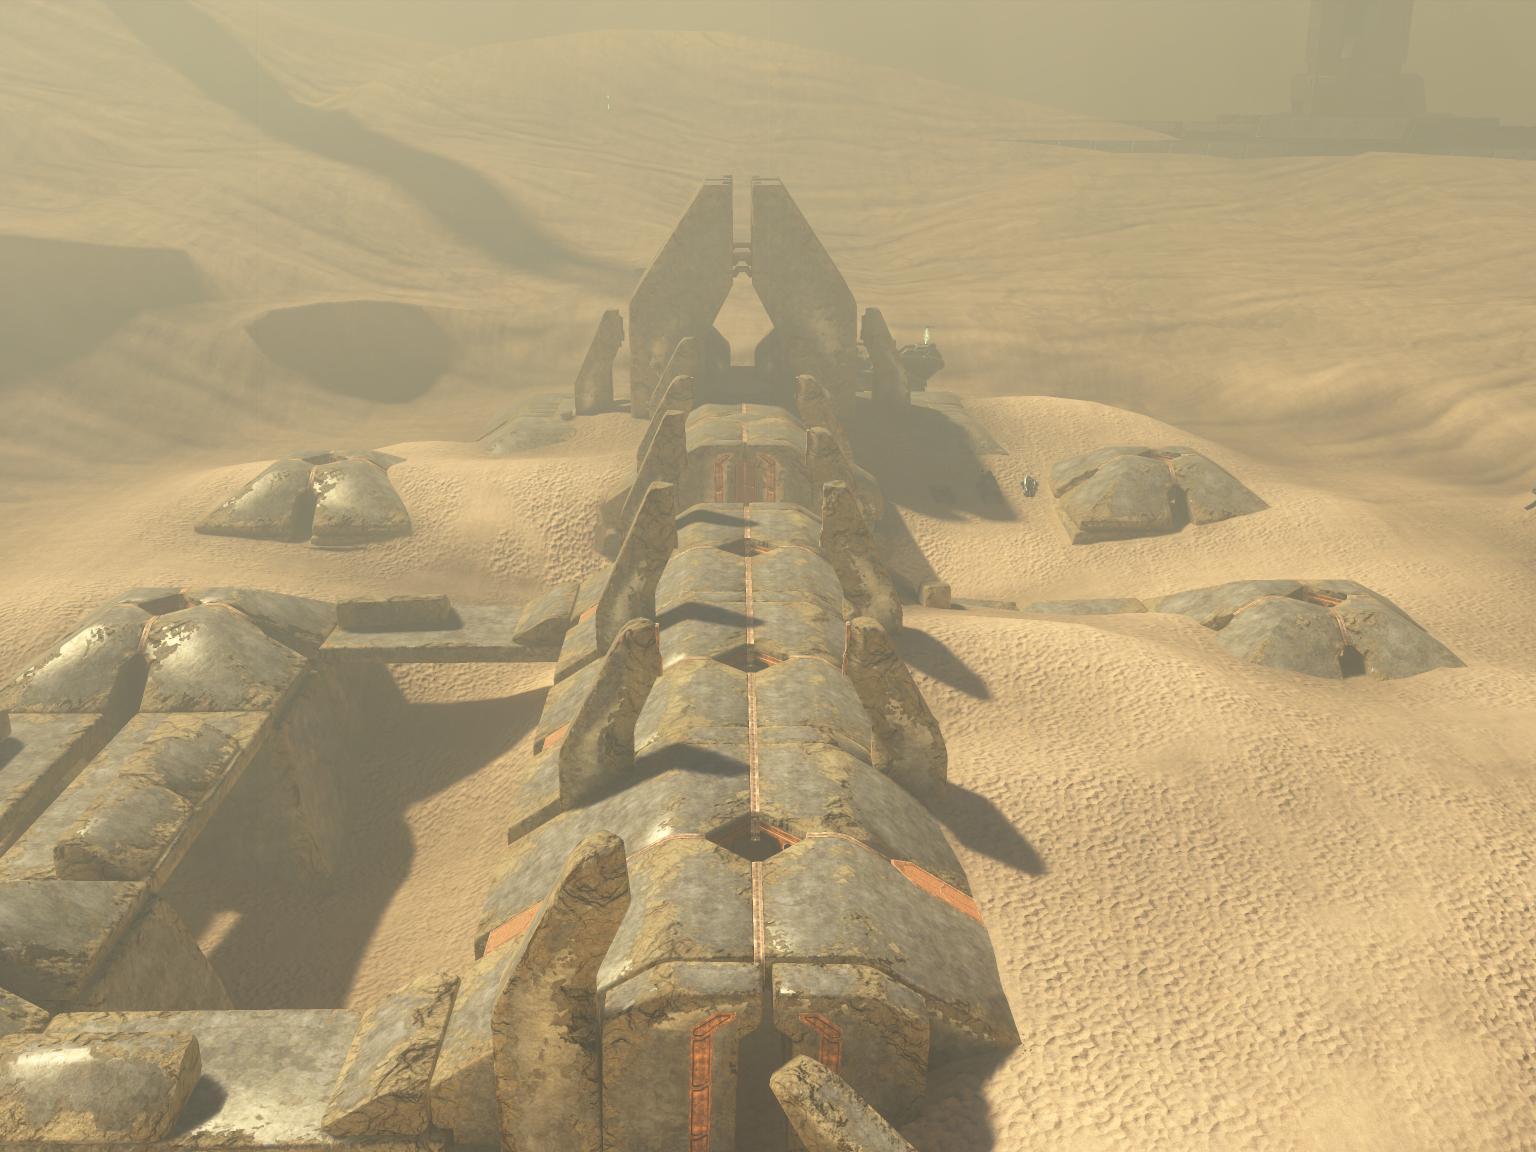 Halo 3 Maps In Halo 5 Billedgalleri - whitman gelo-seco info